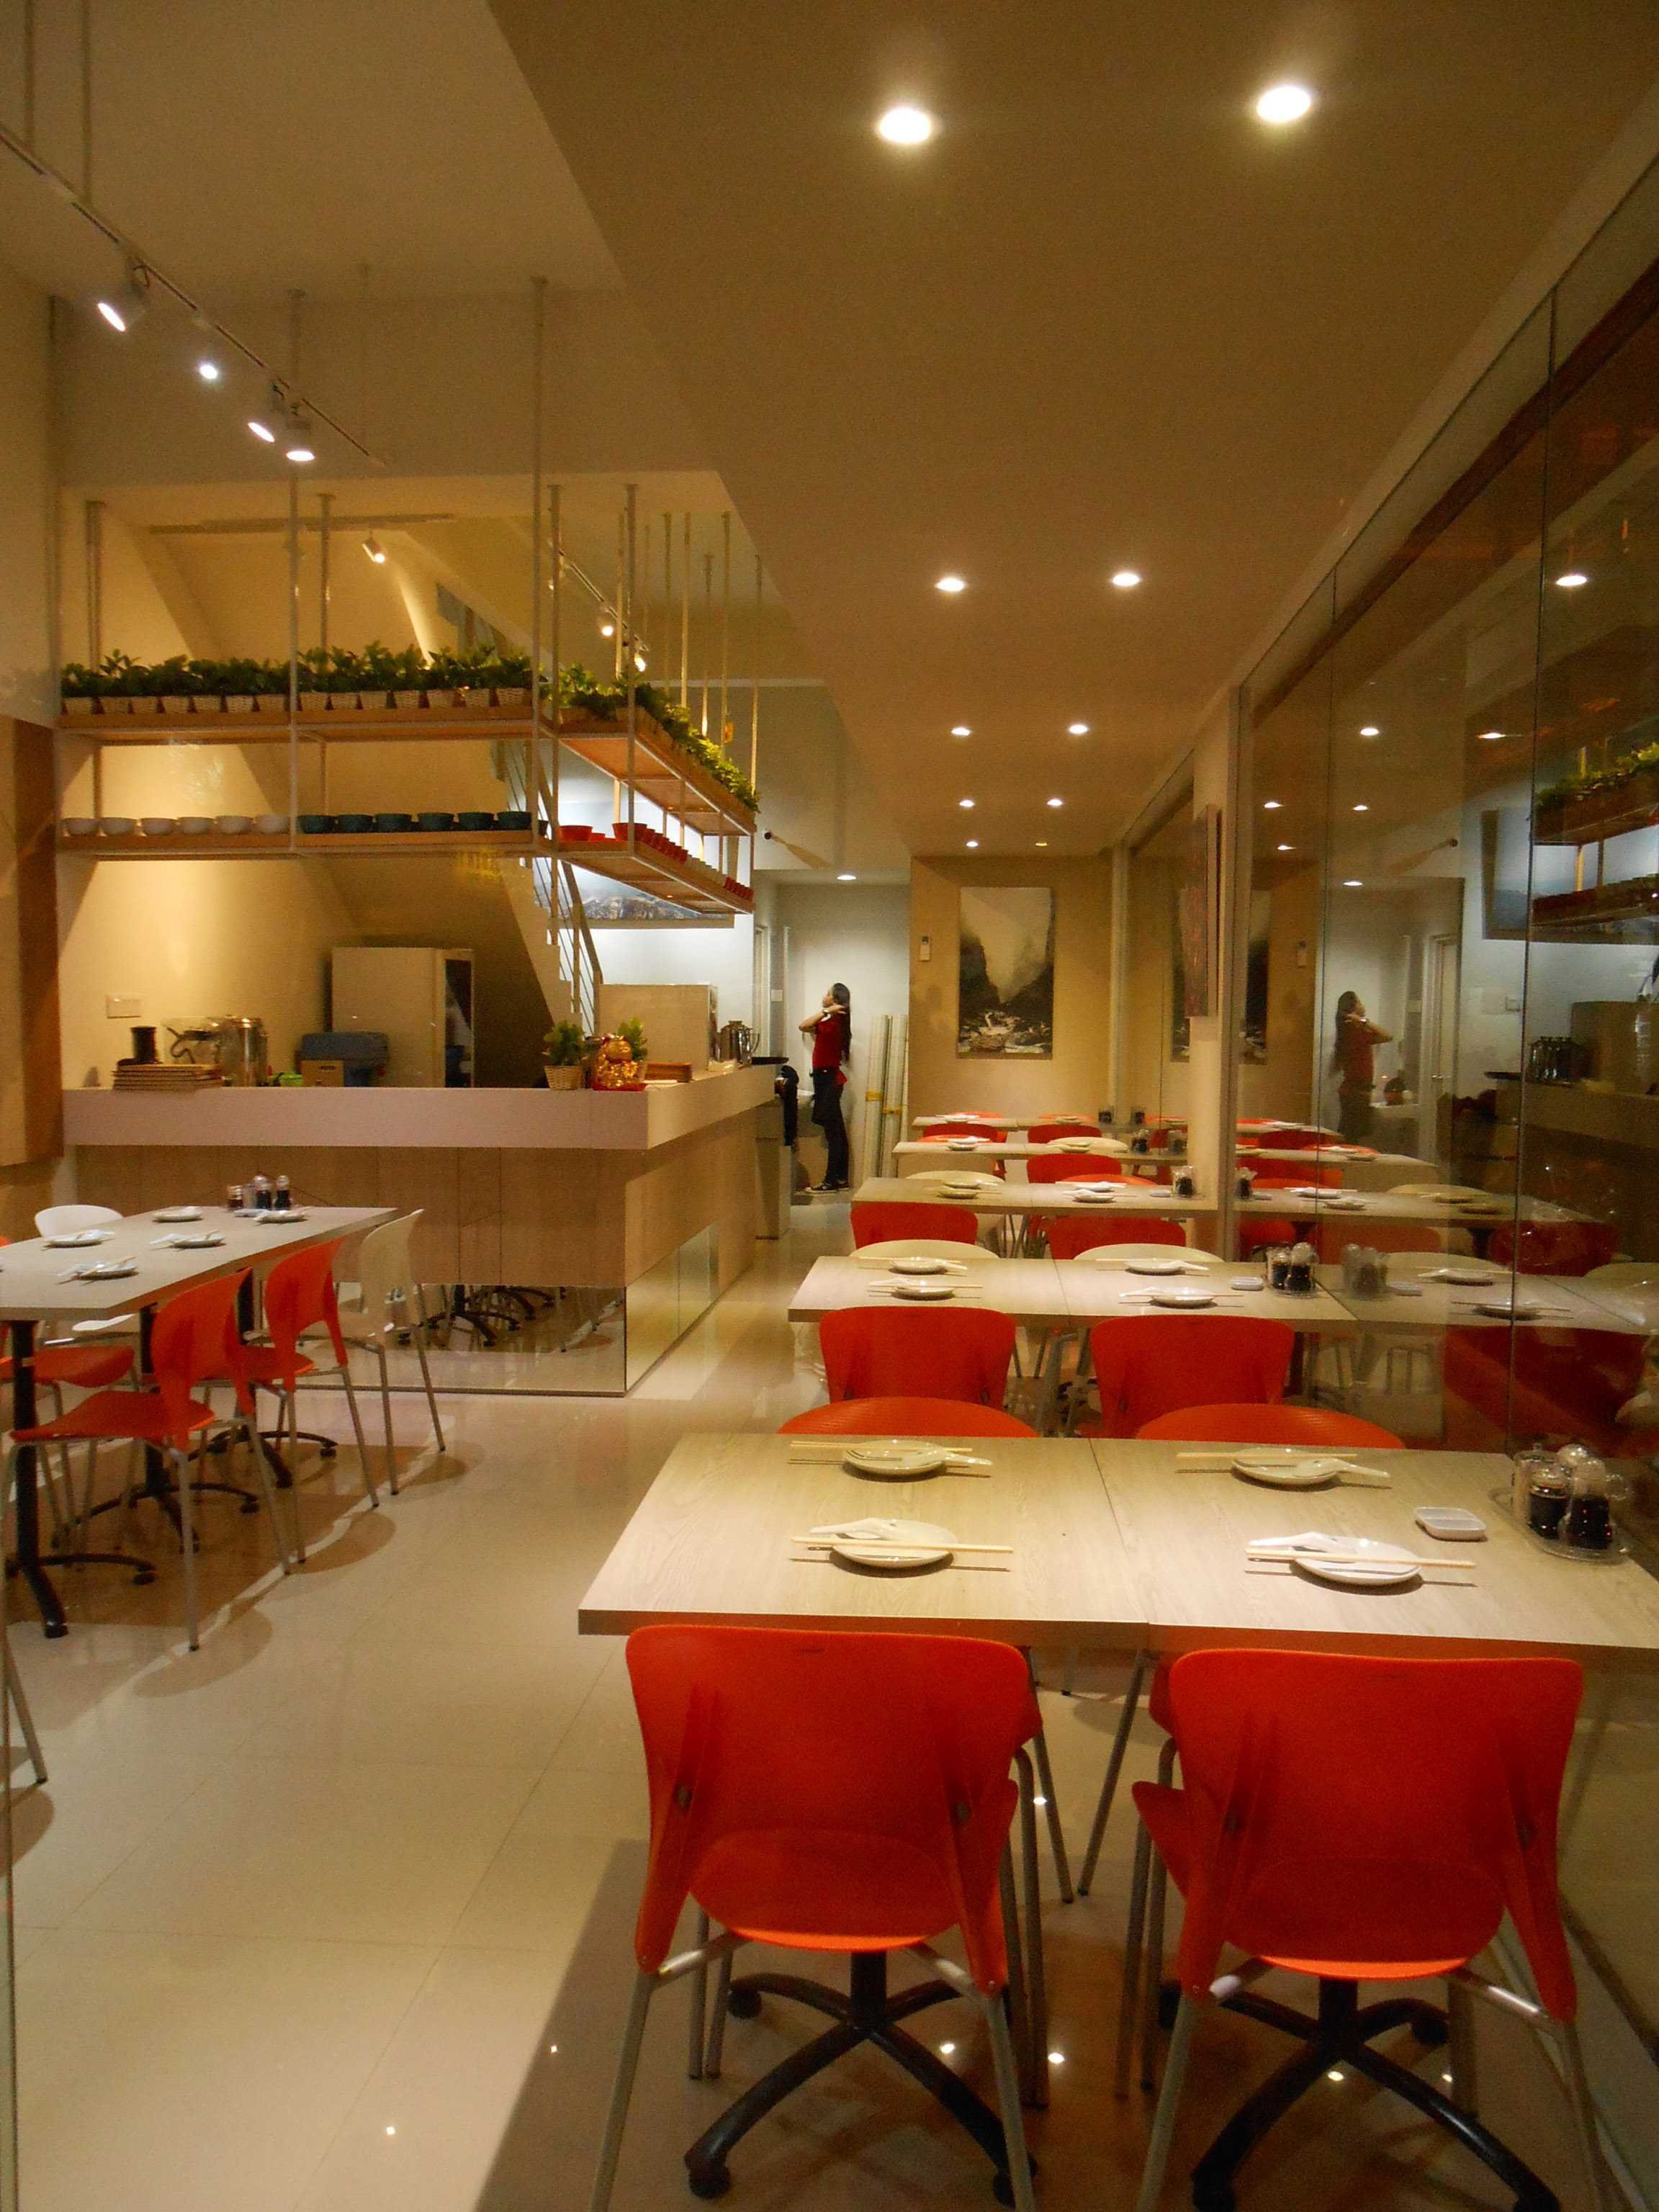 Studio Tektonik Resto Xian Feng Di Golden Boulevard, Jl. Raya Serpong, Lengkong Karya, Serpong Utara, Kota Tangerang Selatan, Banten 15310, Indonesia  003-Lr-2 Modern,asian  31680